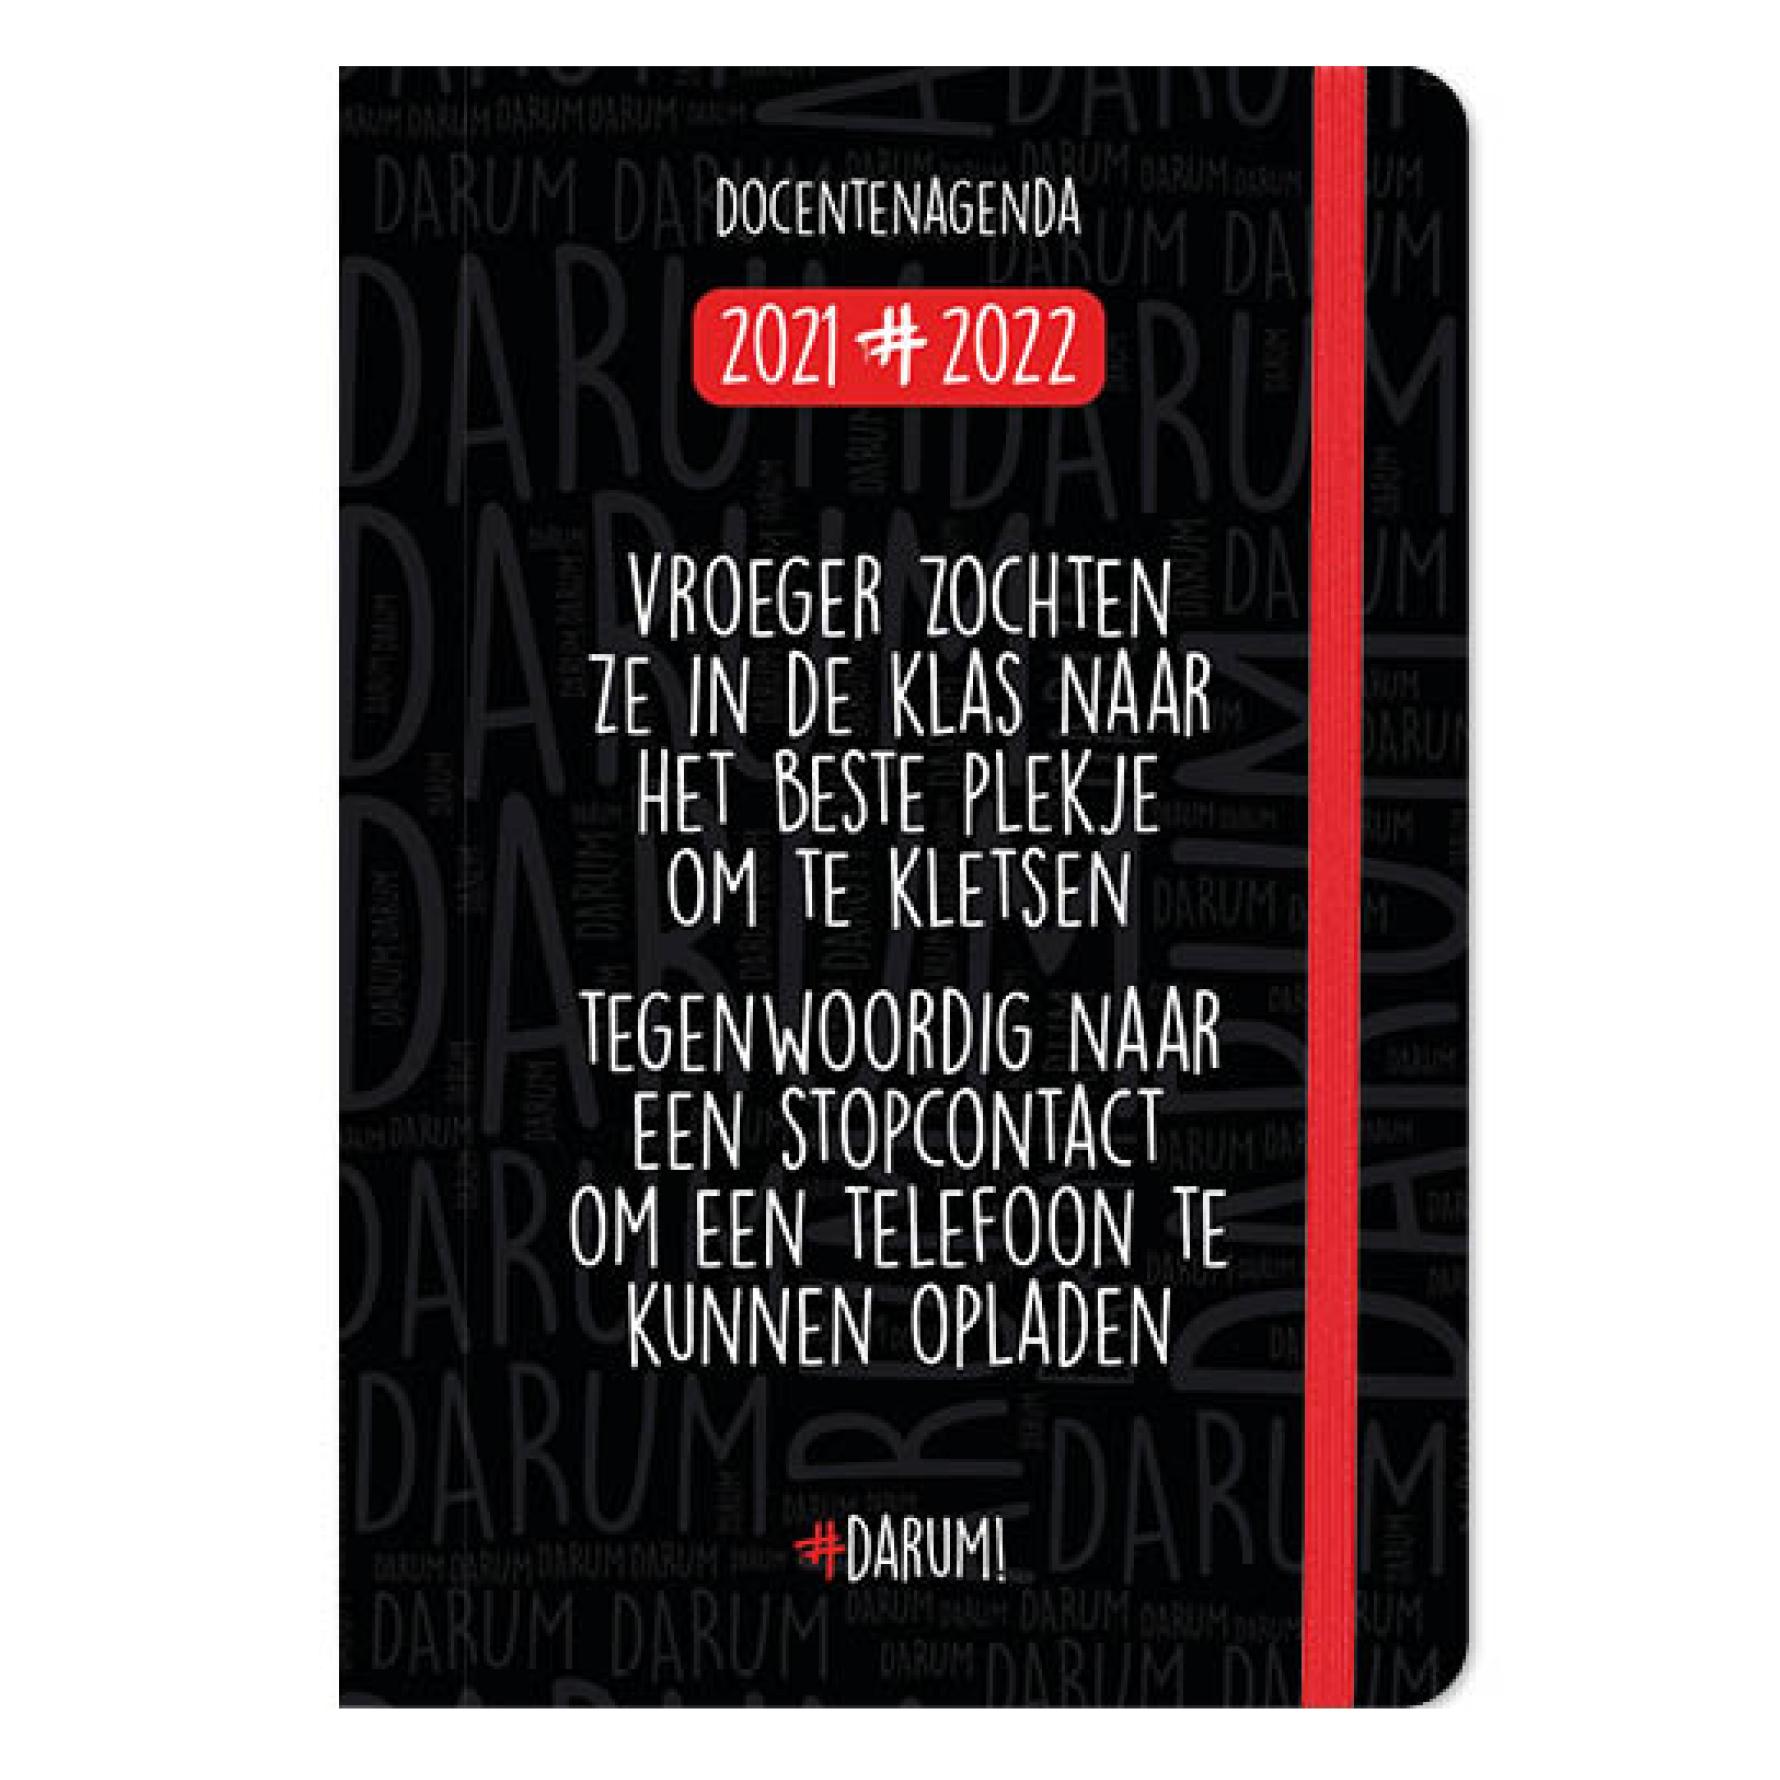 Agenda - 2022 - Docentenagenda - Darum! - A5 - 14,8x21cm